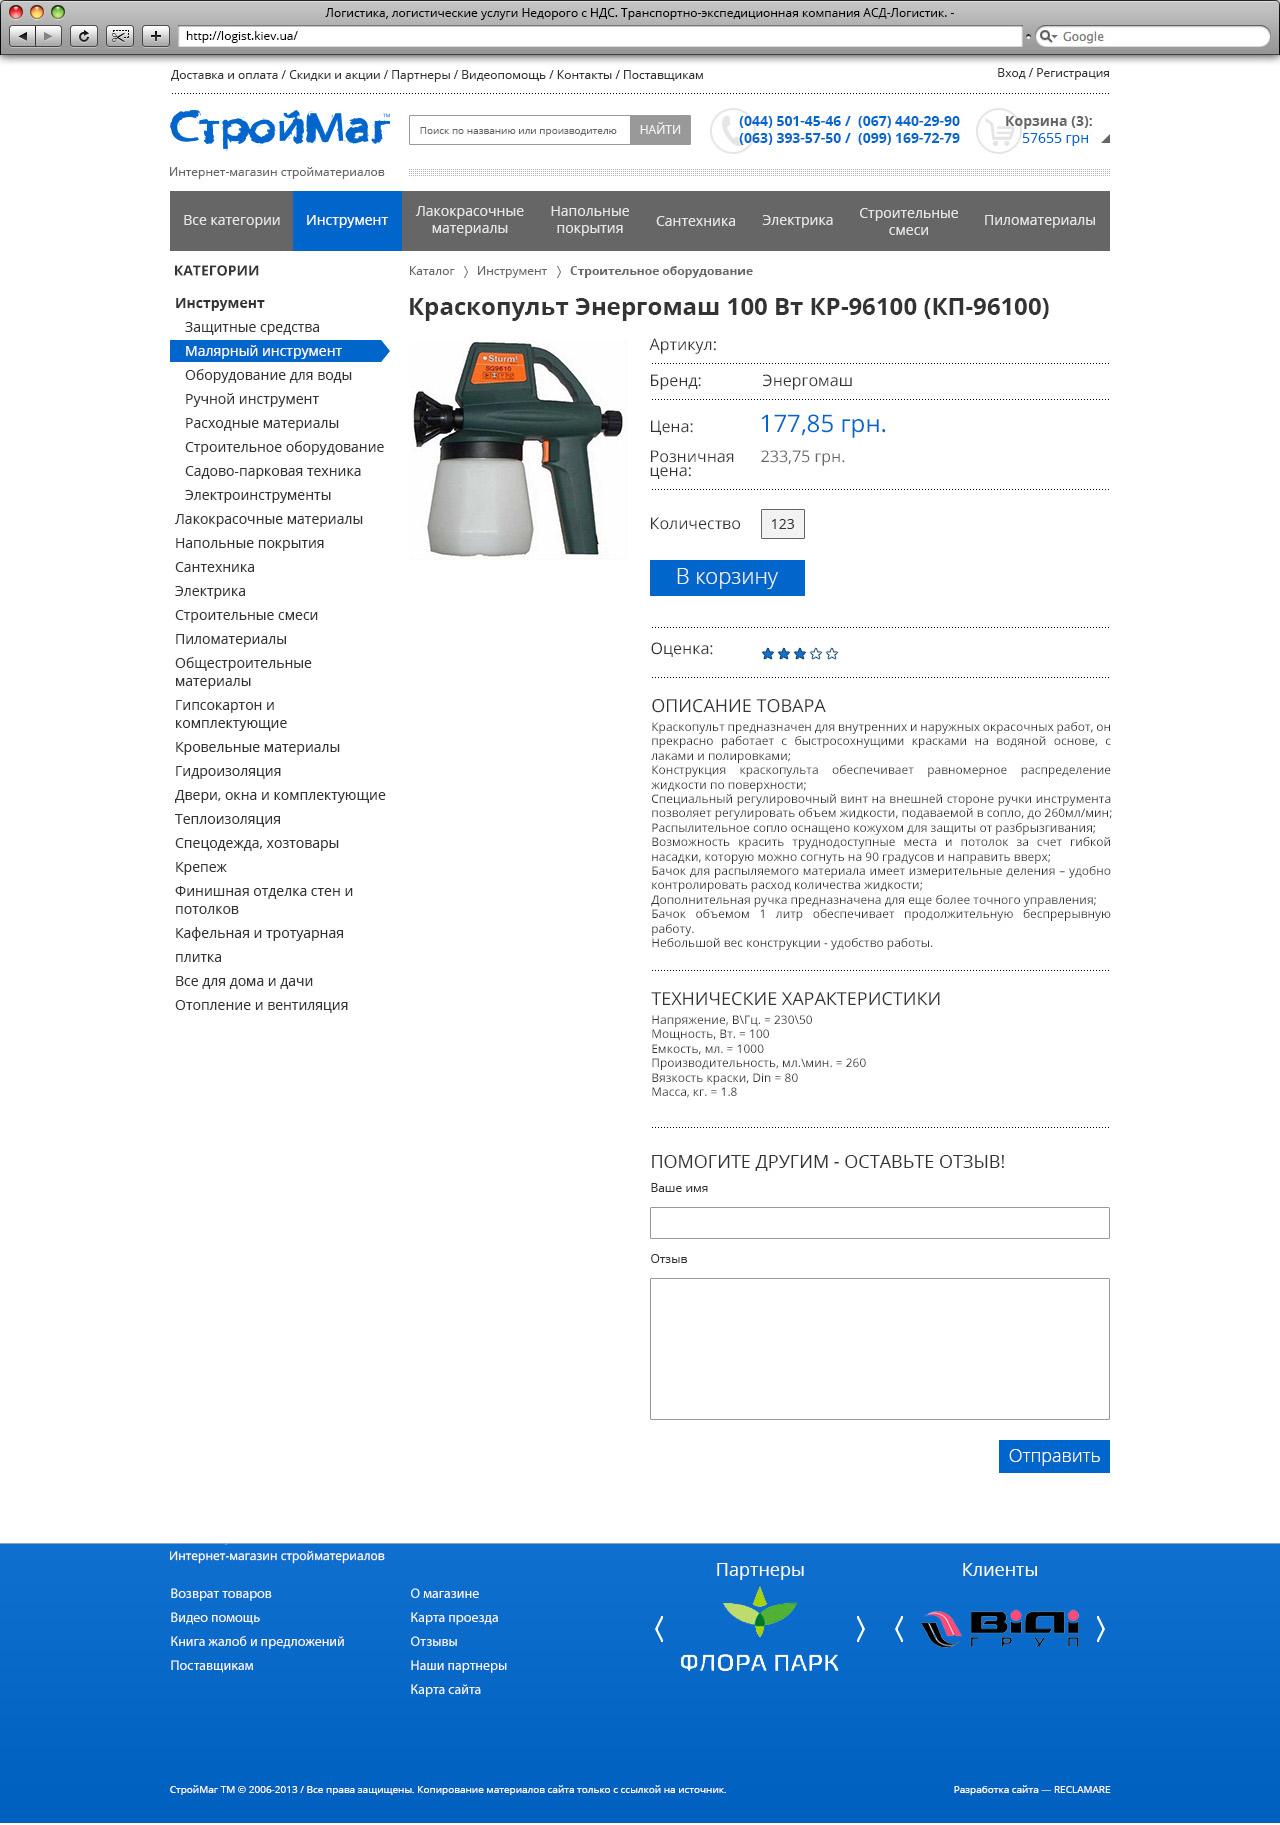 strojmag_product